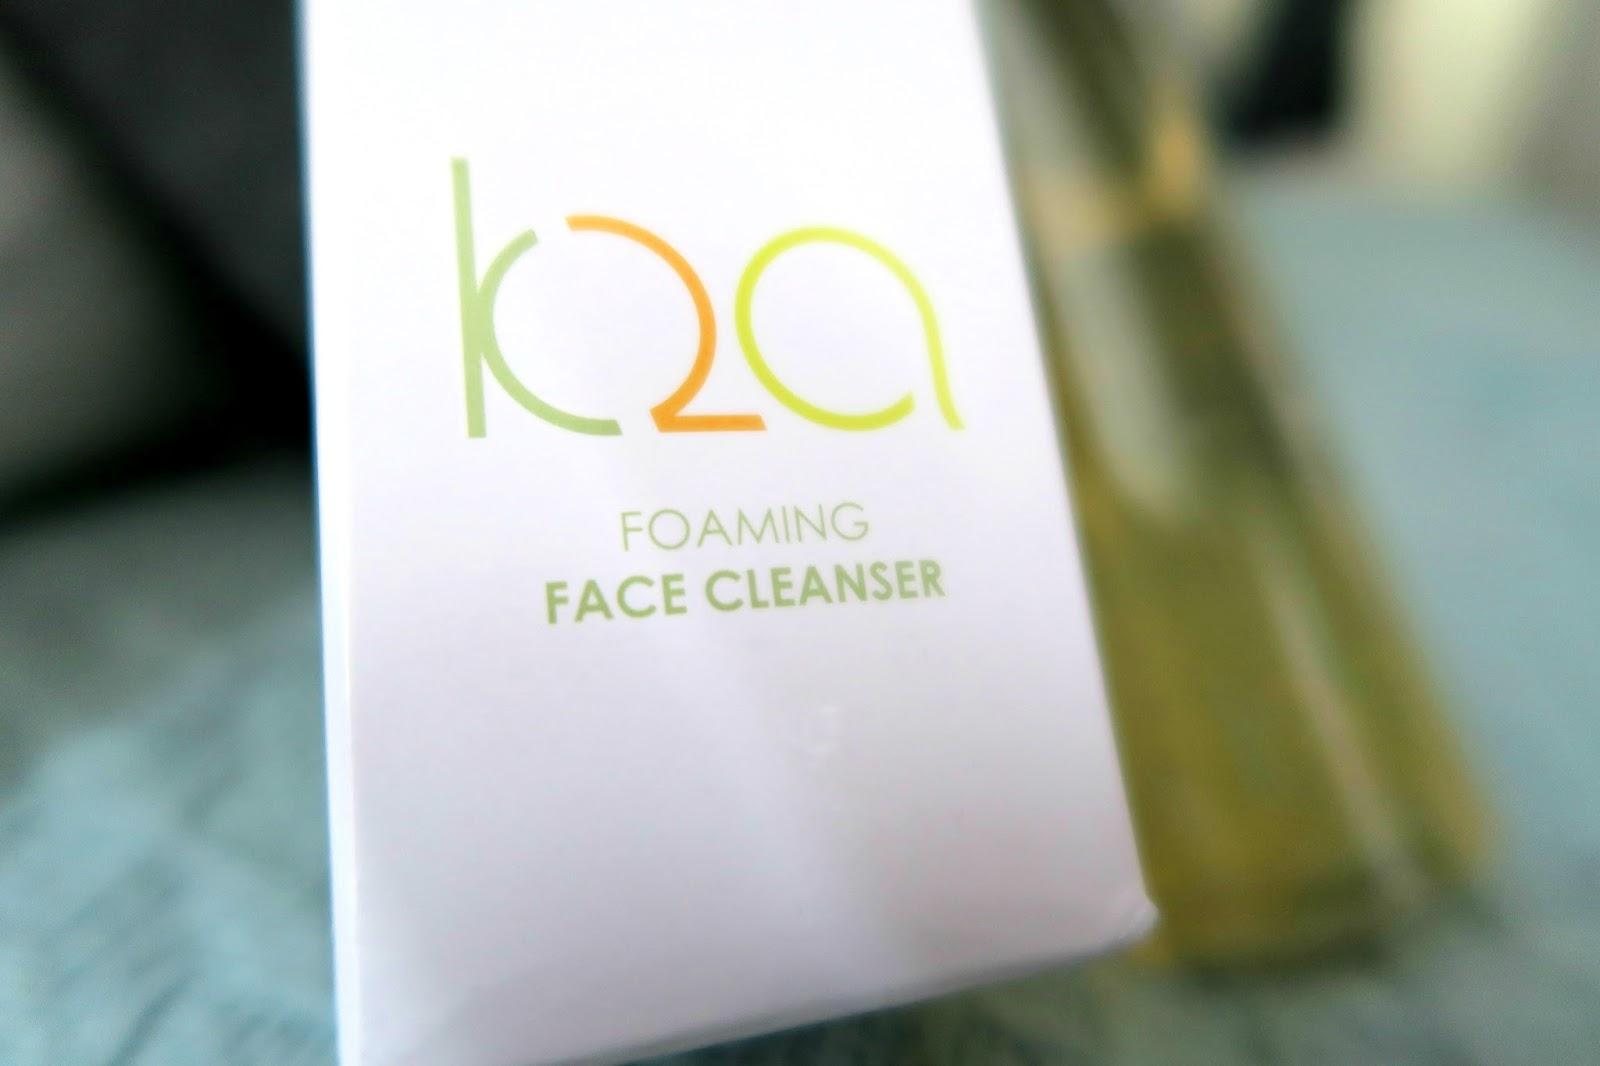 K2A packaging